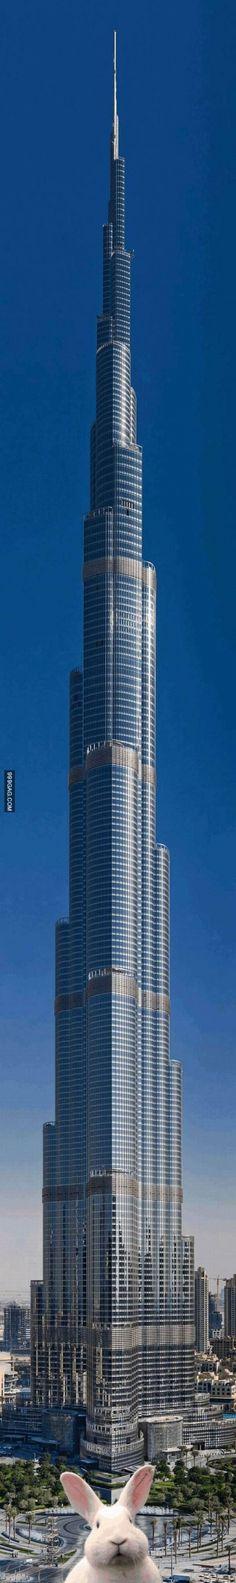 Meanwhile In The Burj Khalifa